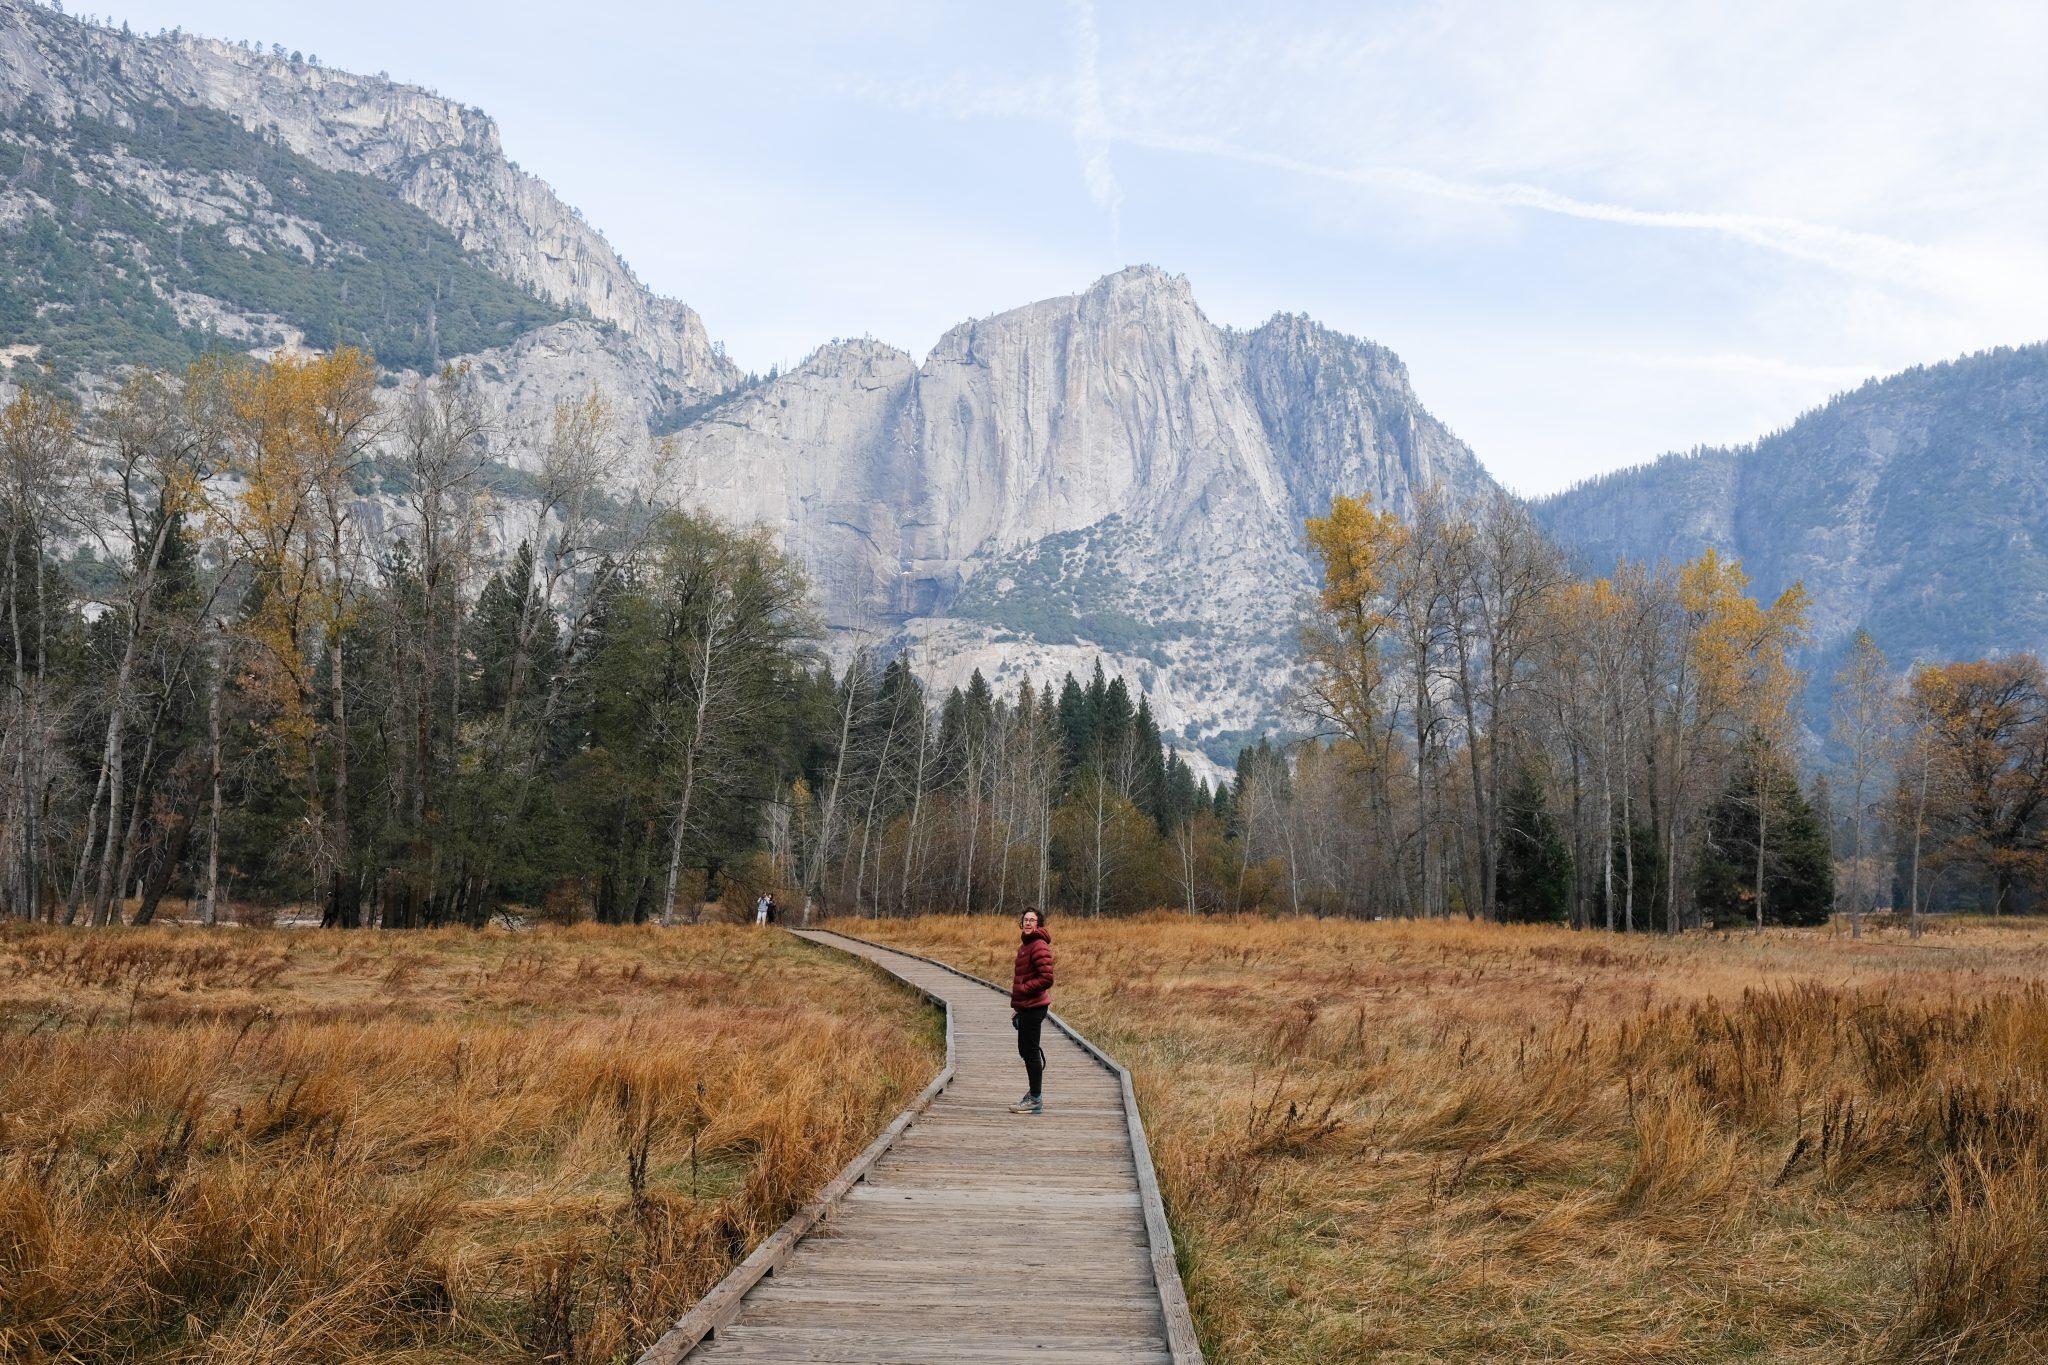 woman on a bridge in Yosemite National Park